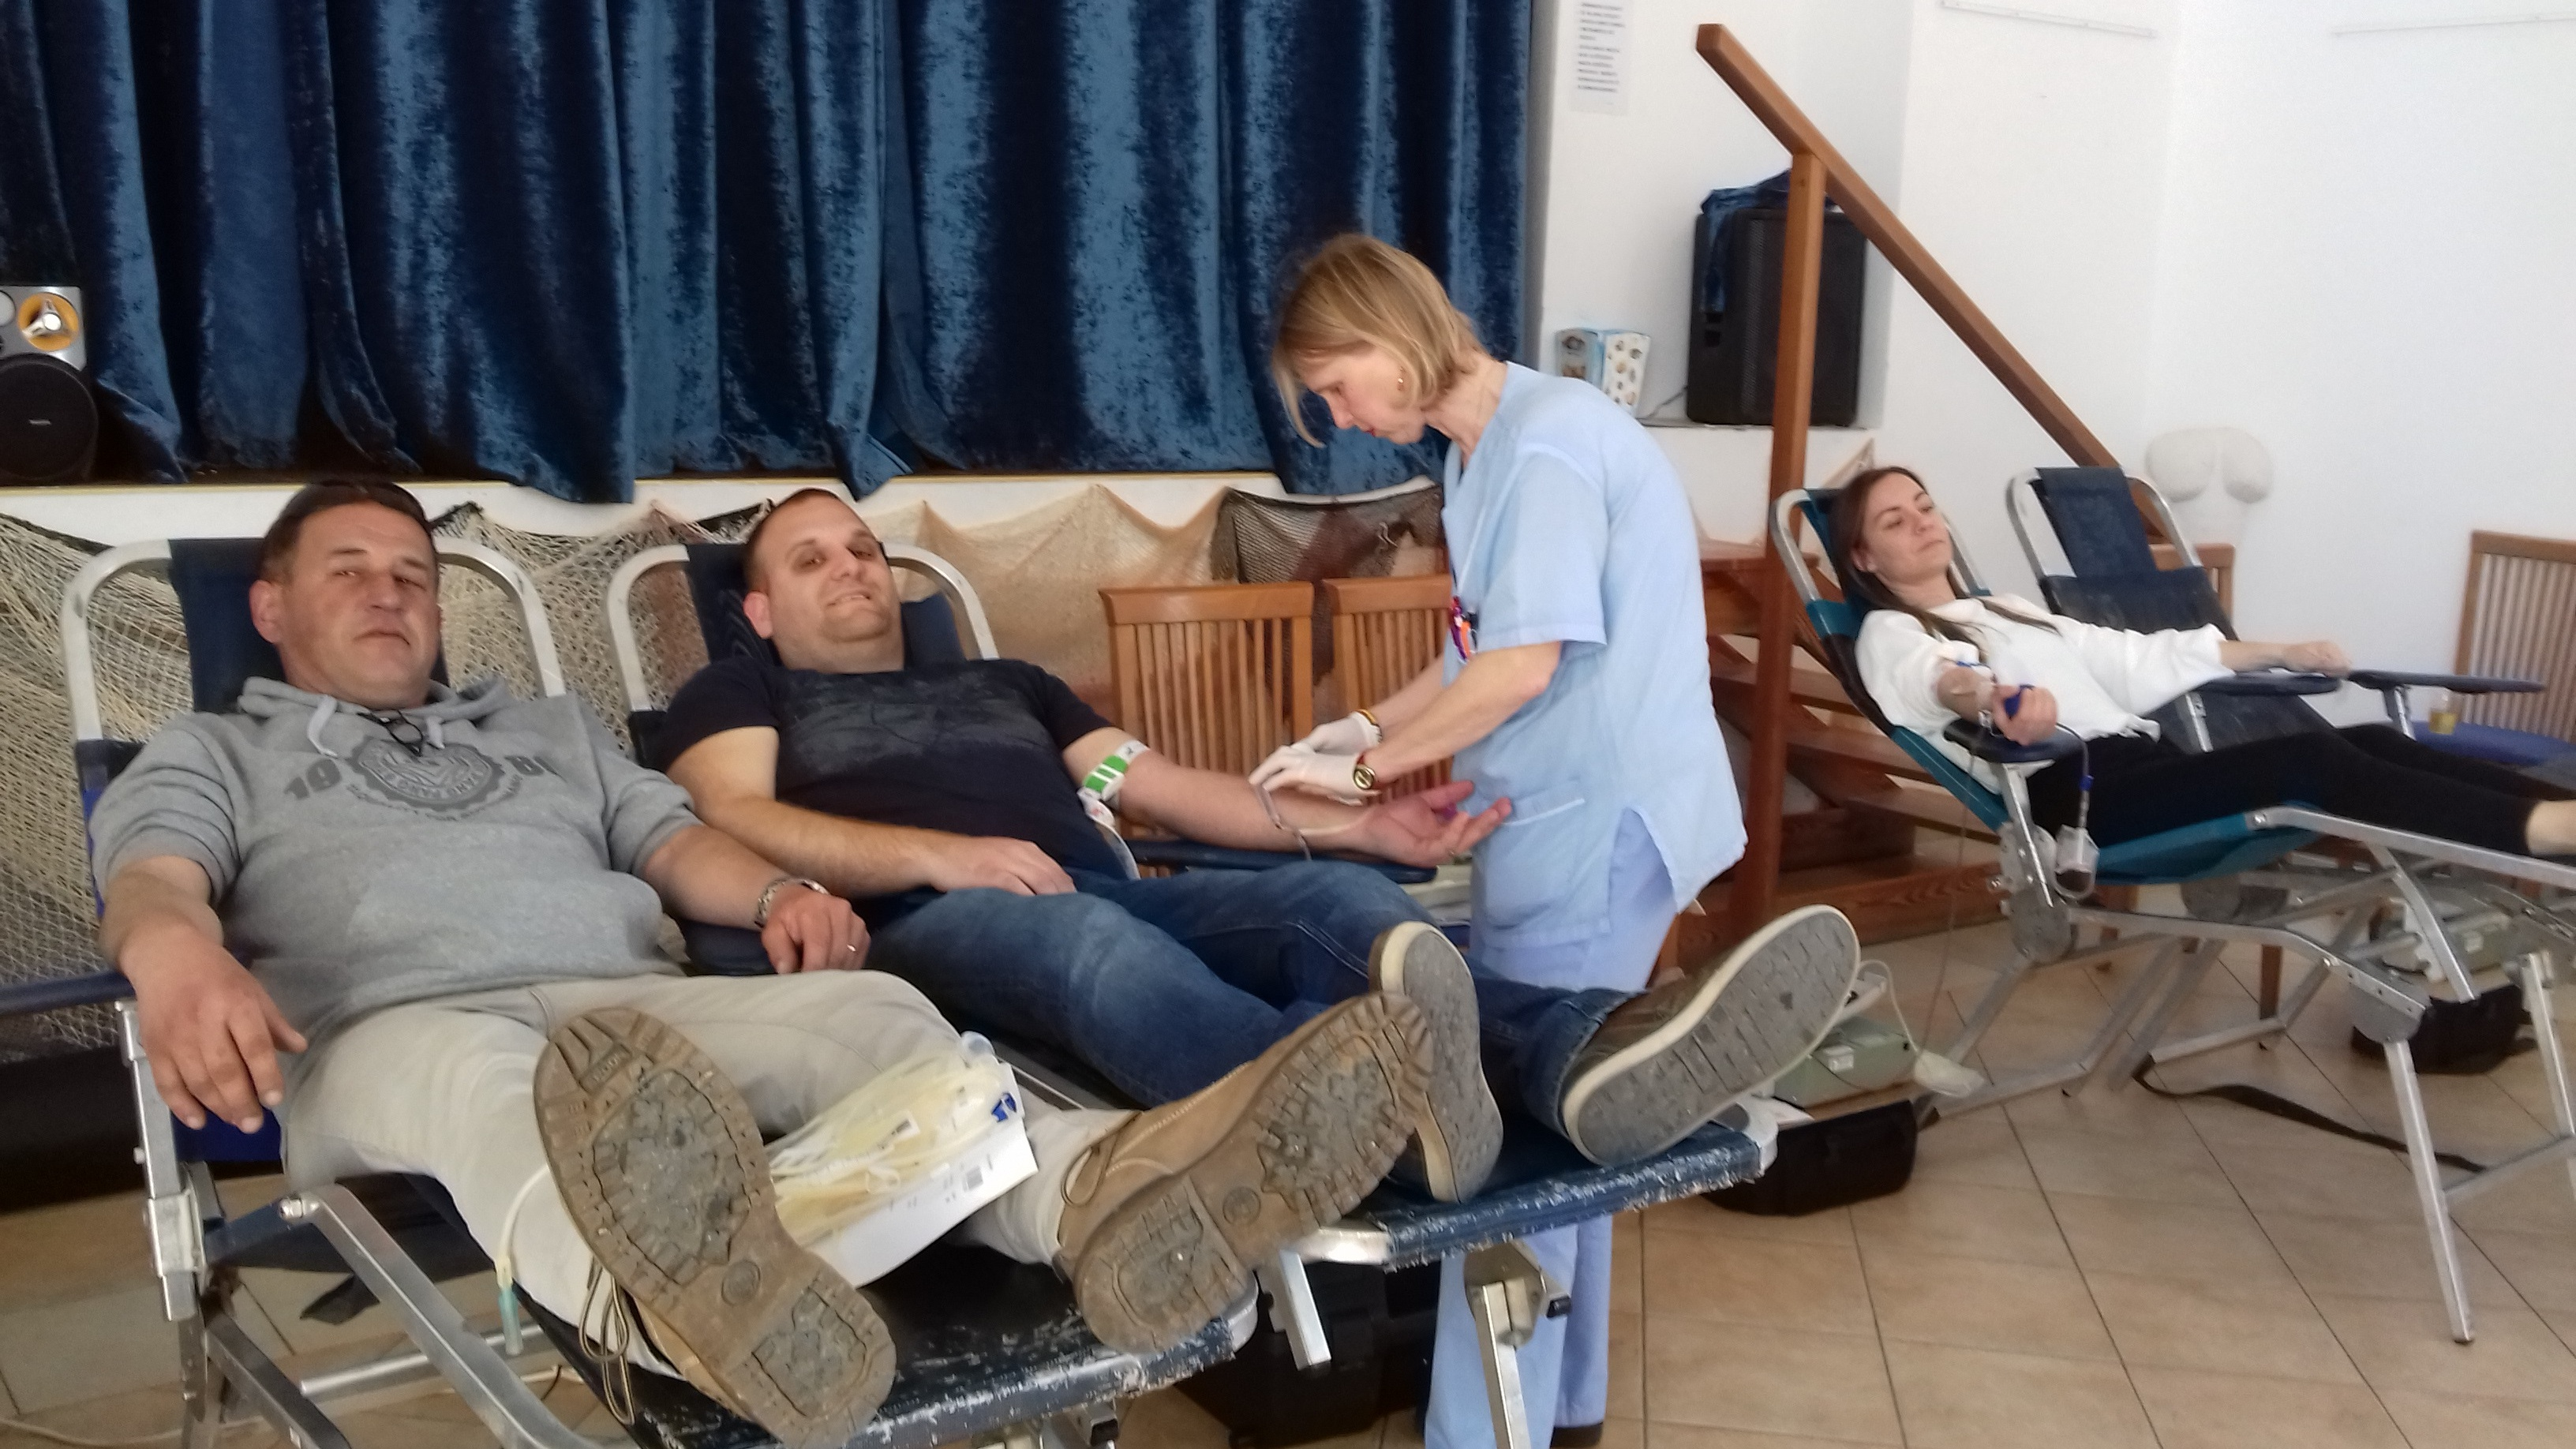 Akcija darivanja krvi DDK Preko: Prikupljene 22 doze